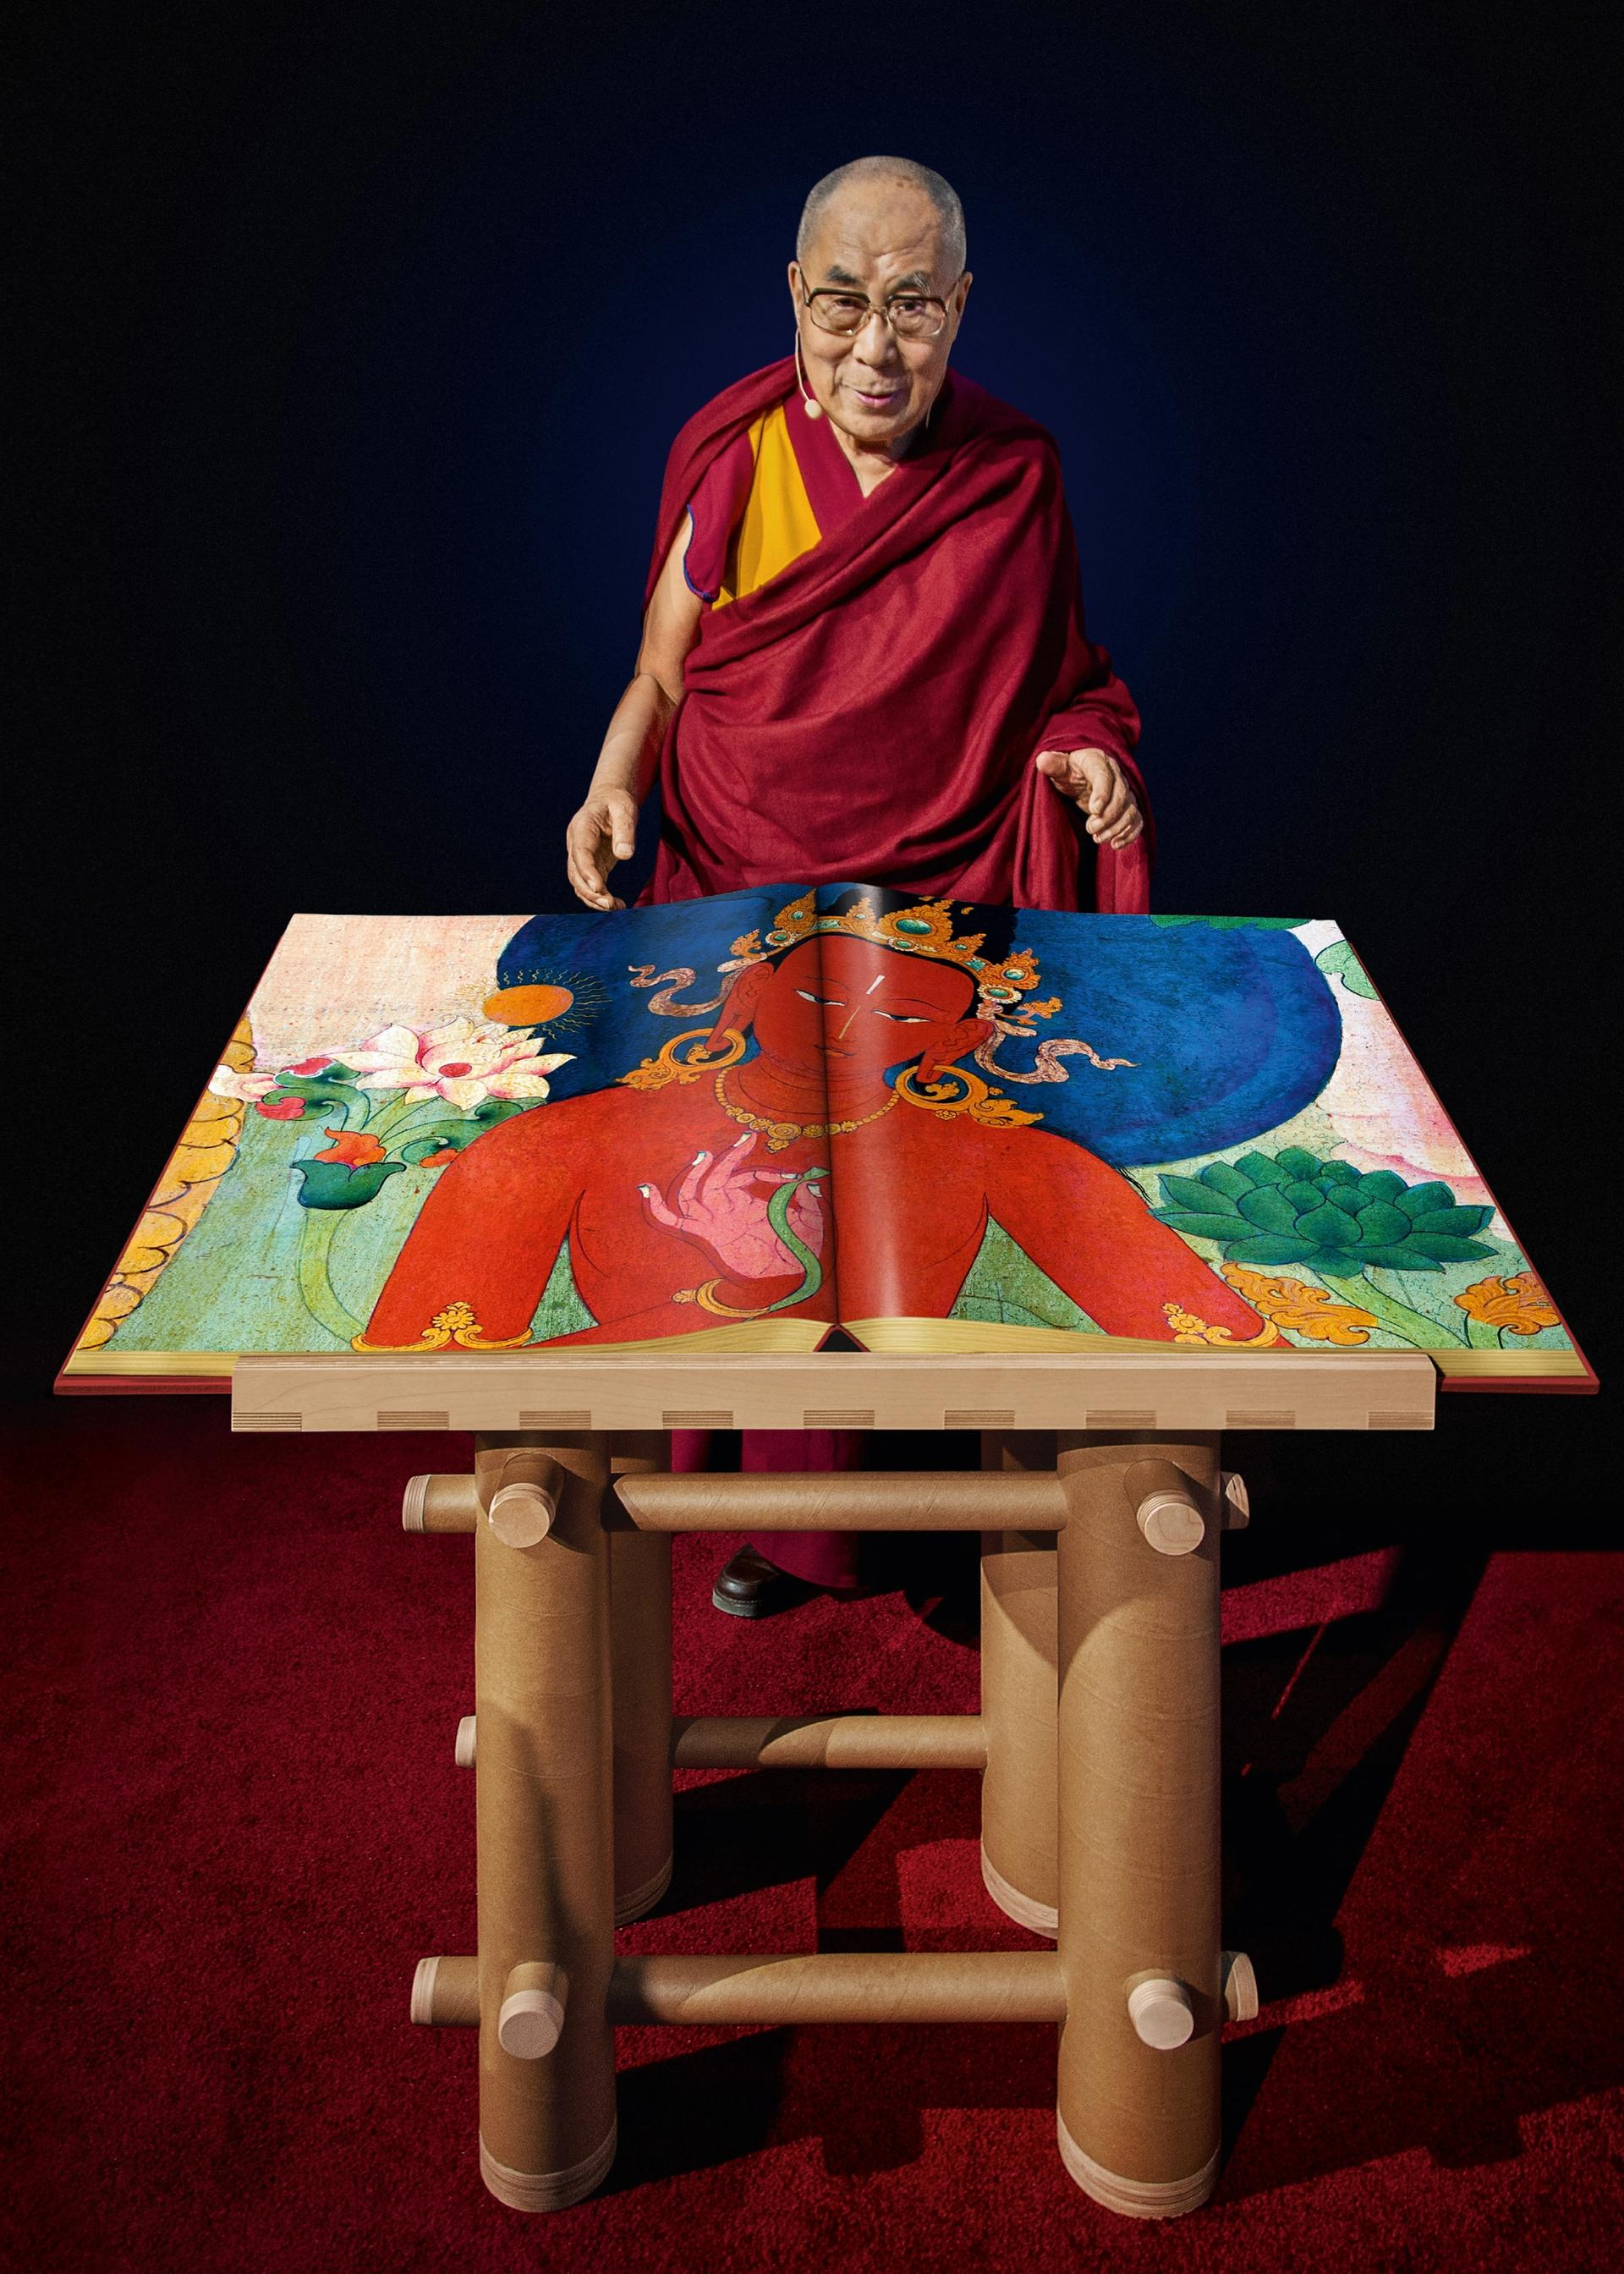 Tenzin Gyatso, the Fourteenth Dalai Lama, with a draft copy of Murals of Tibet Photo: Mina Magda © TASCHEN